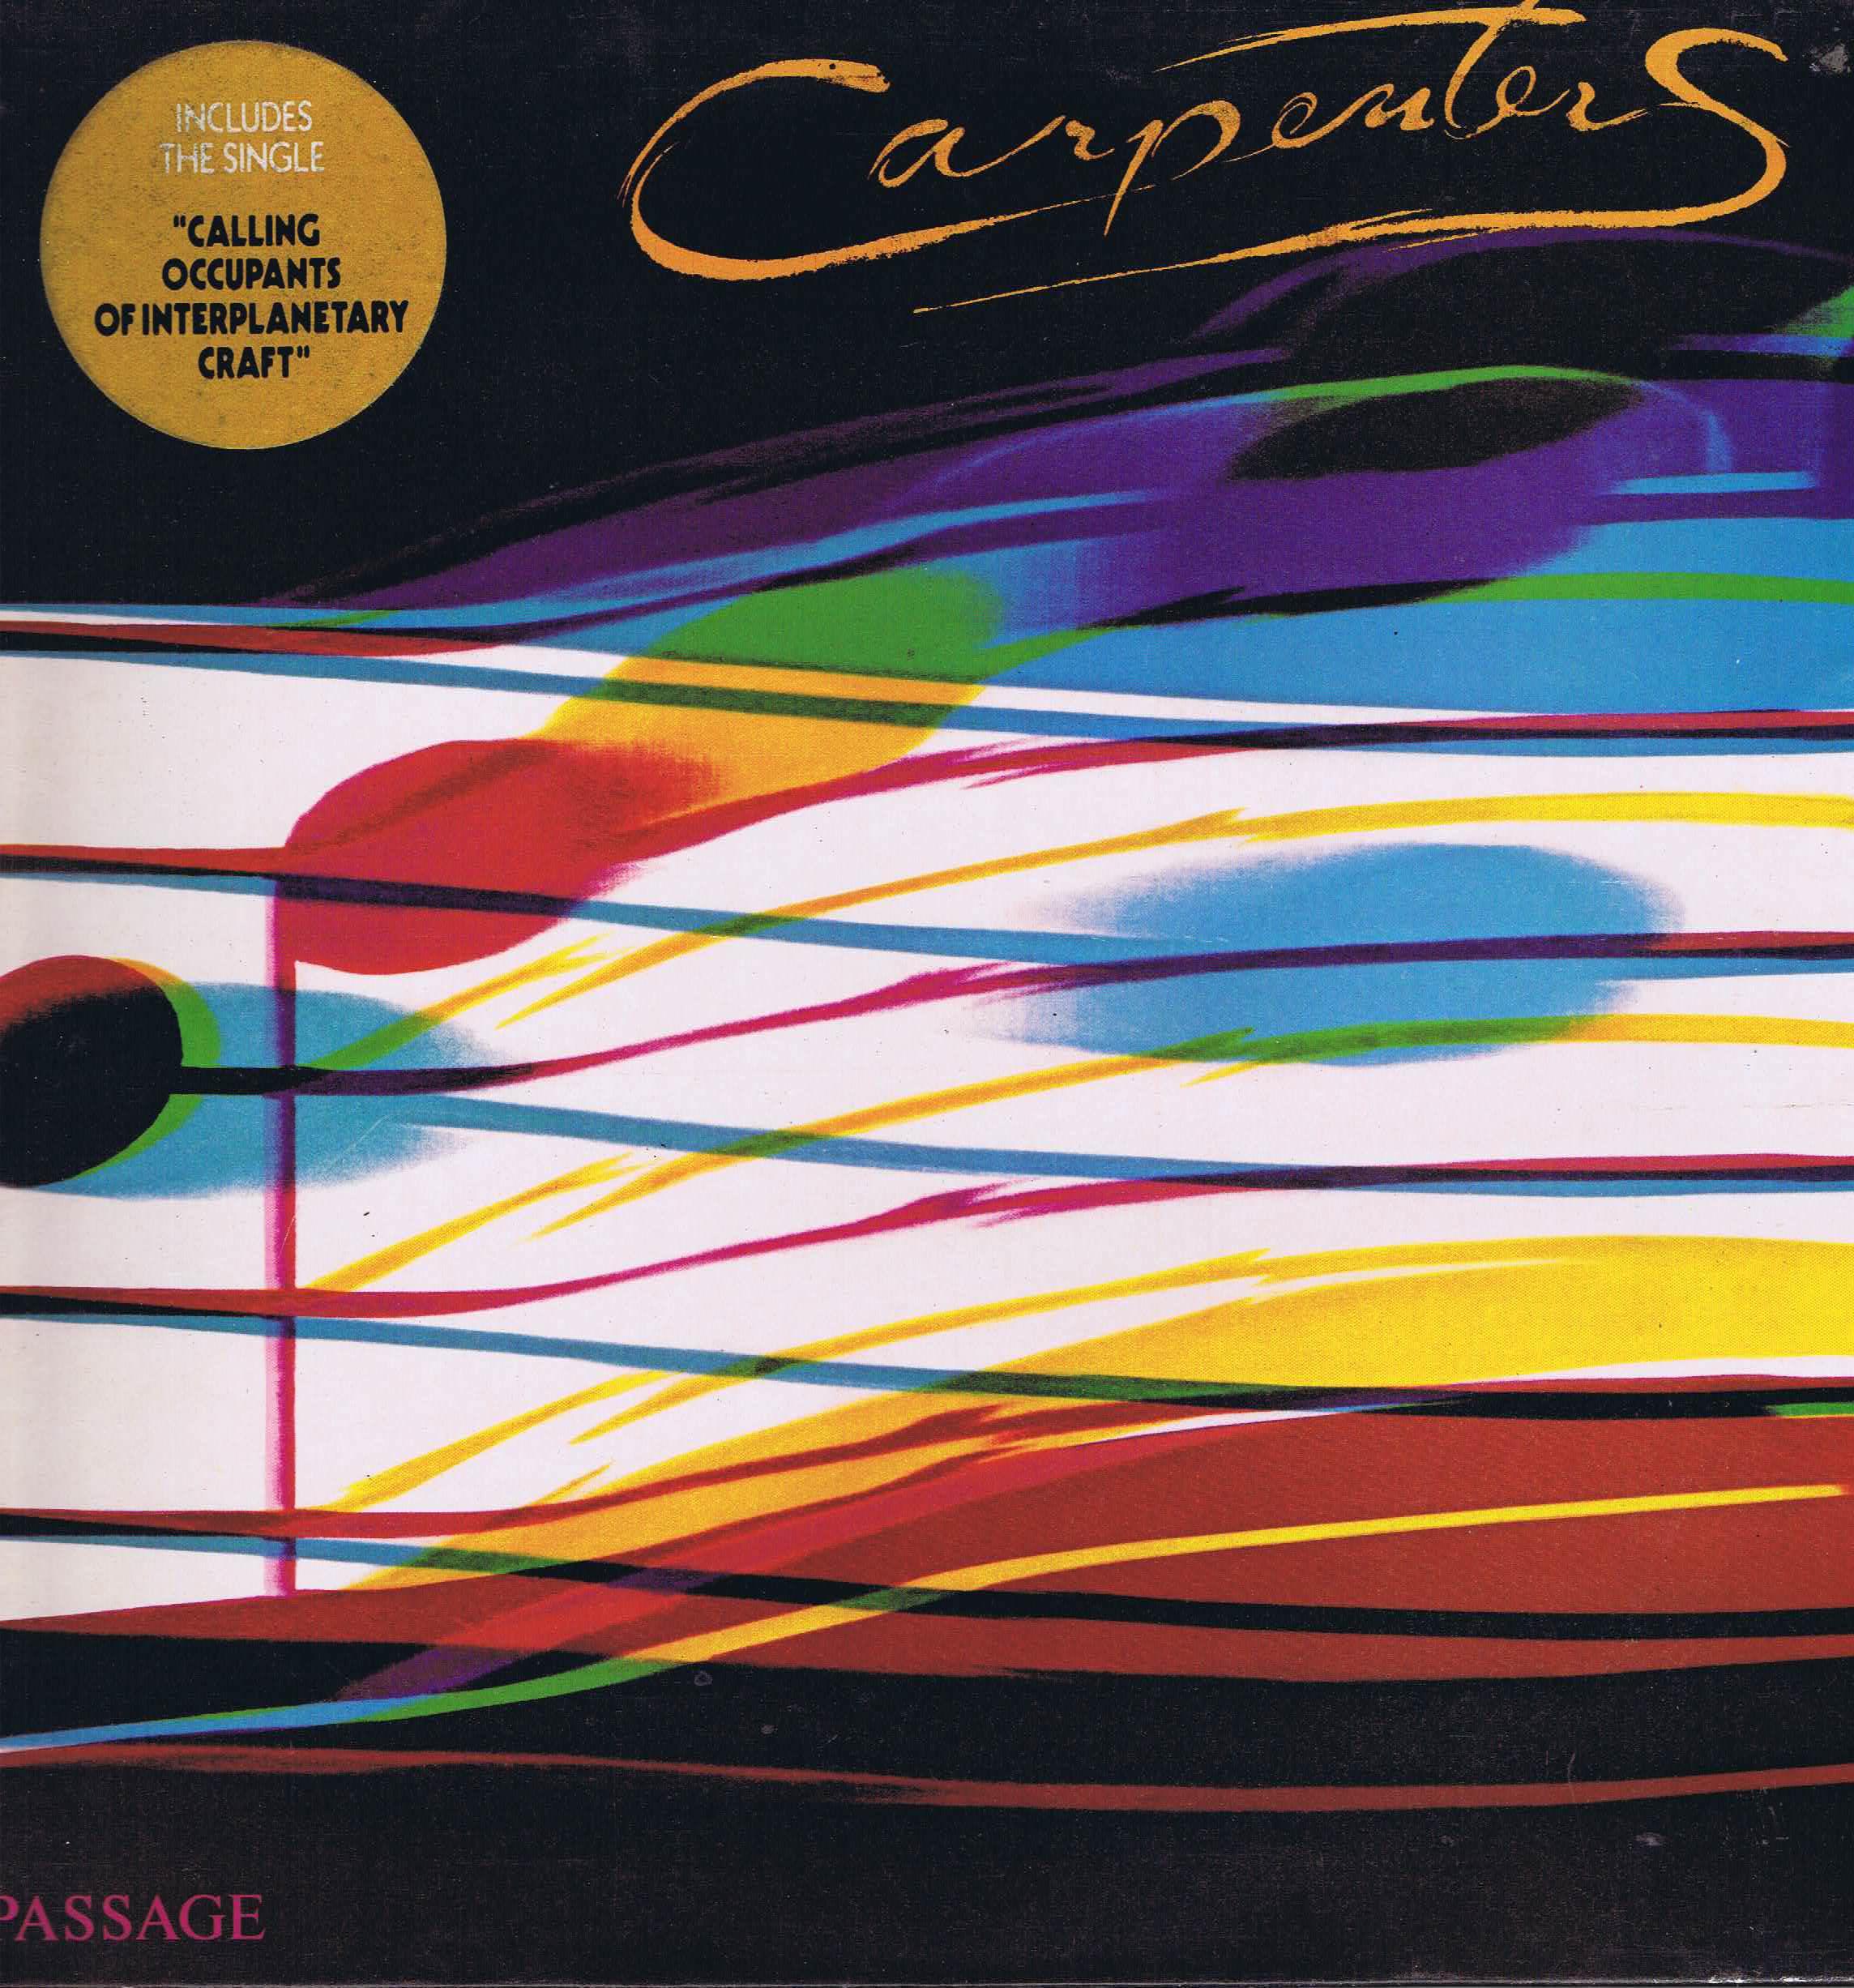 Carpenters Passage Amls 68403 Lp Vinyl Record Wax